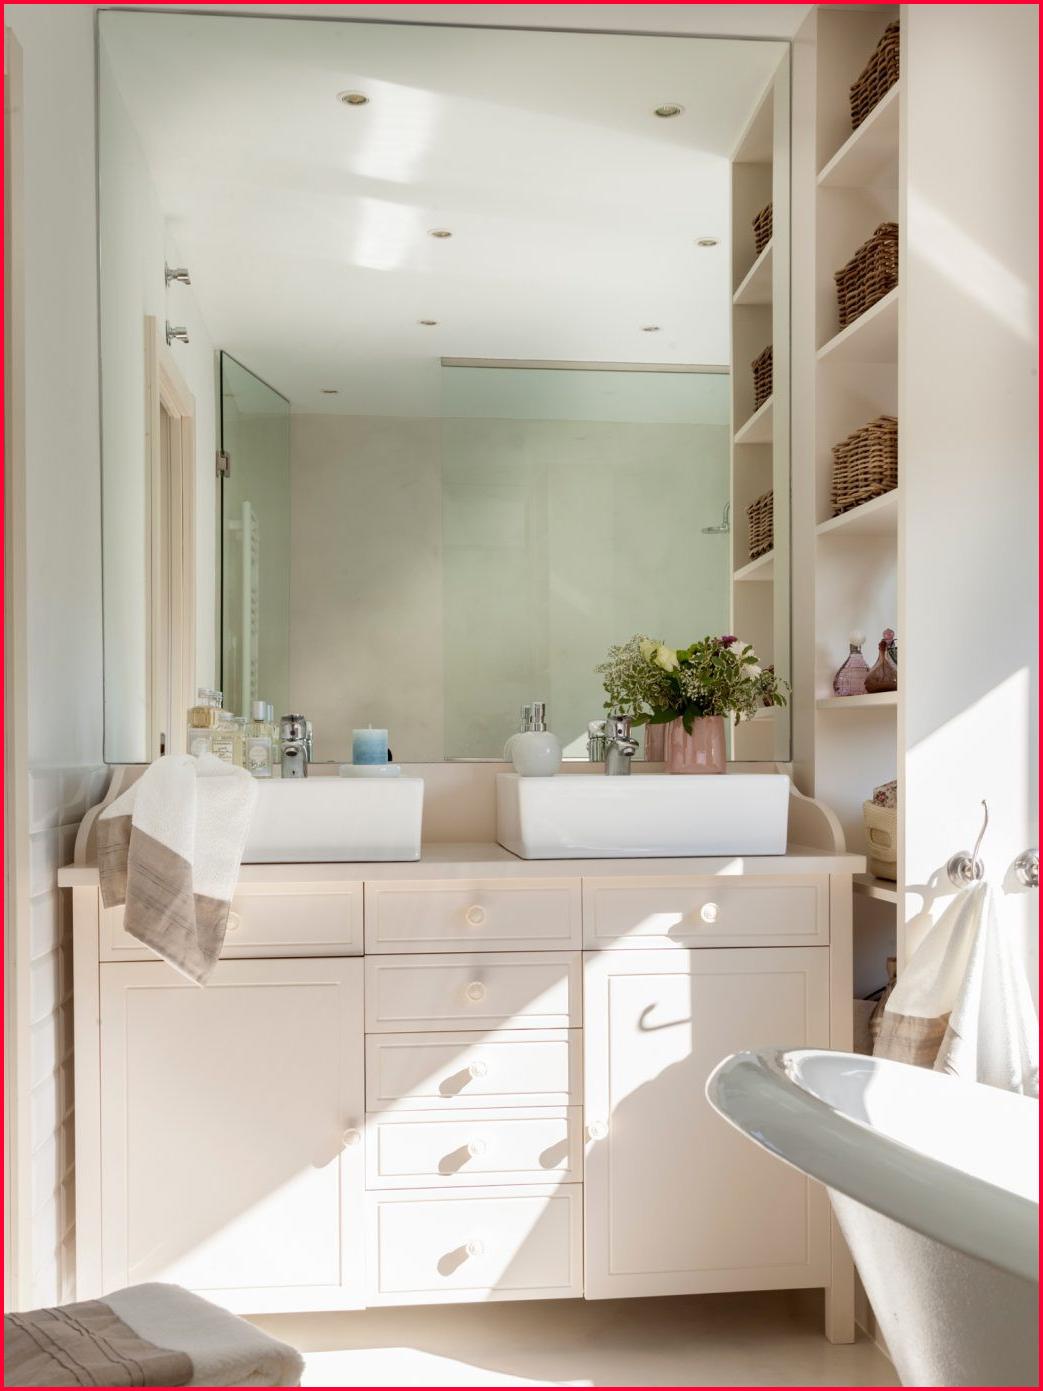 Lavabos Pequeños Con Mueble X8d1 Armarios Pequeà Os Baratos Mejor Banoss Ikea Peque Os Muebles